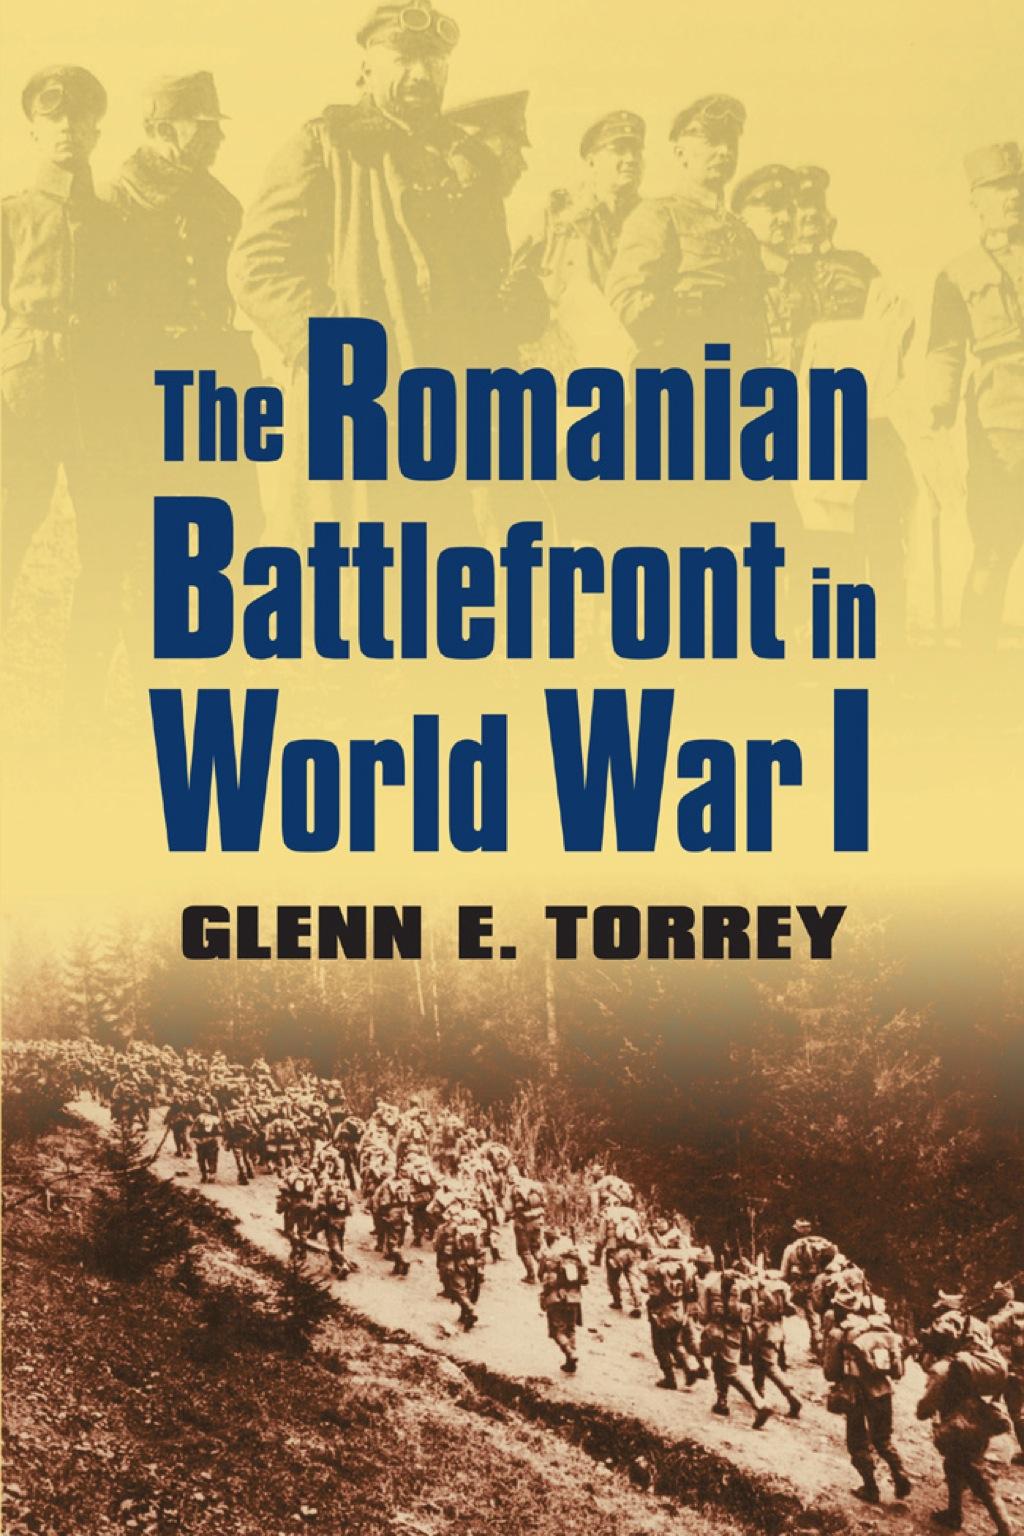 By Glenn E. Torrey PRINTISBN: 9780700620173 E-TEXT ISBN: 9780700620586 Edition: 0